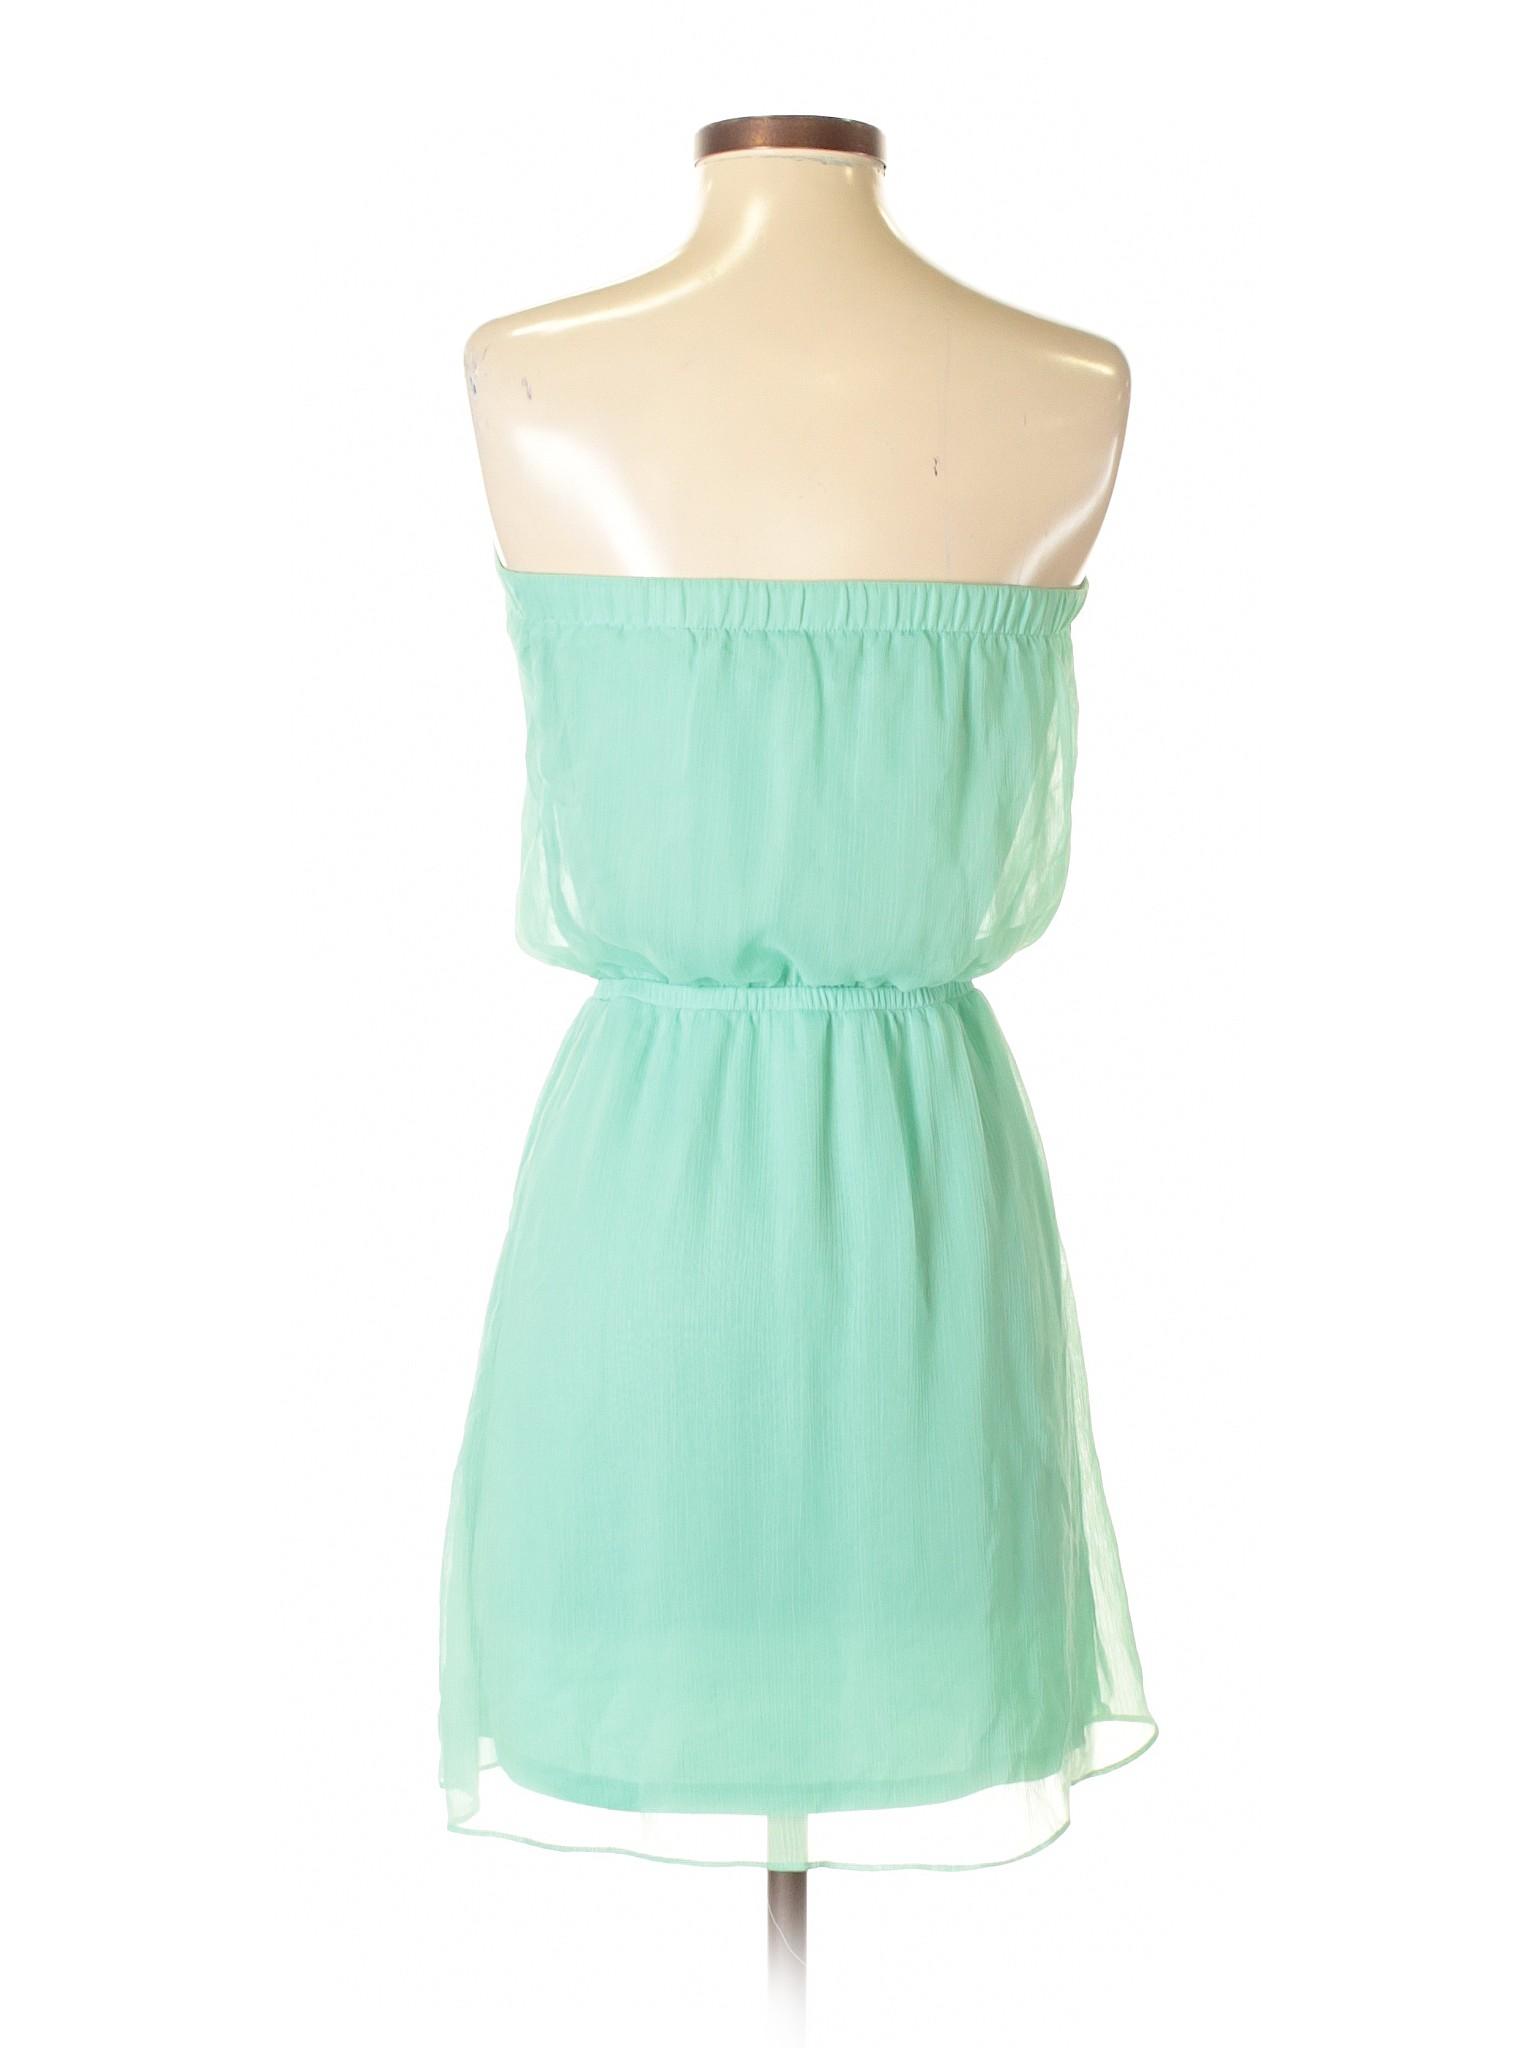 Boutique Winter Winter Dress Express Boutique Casual 00gYPCR